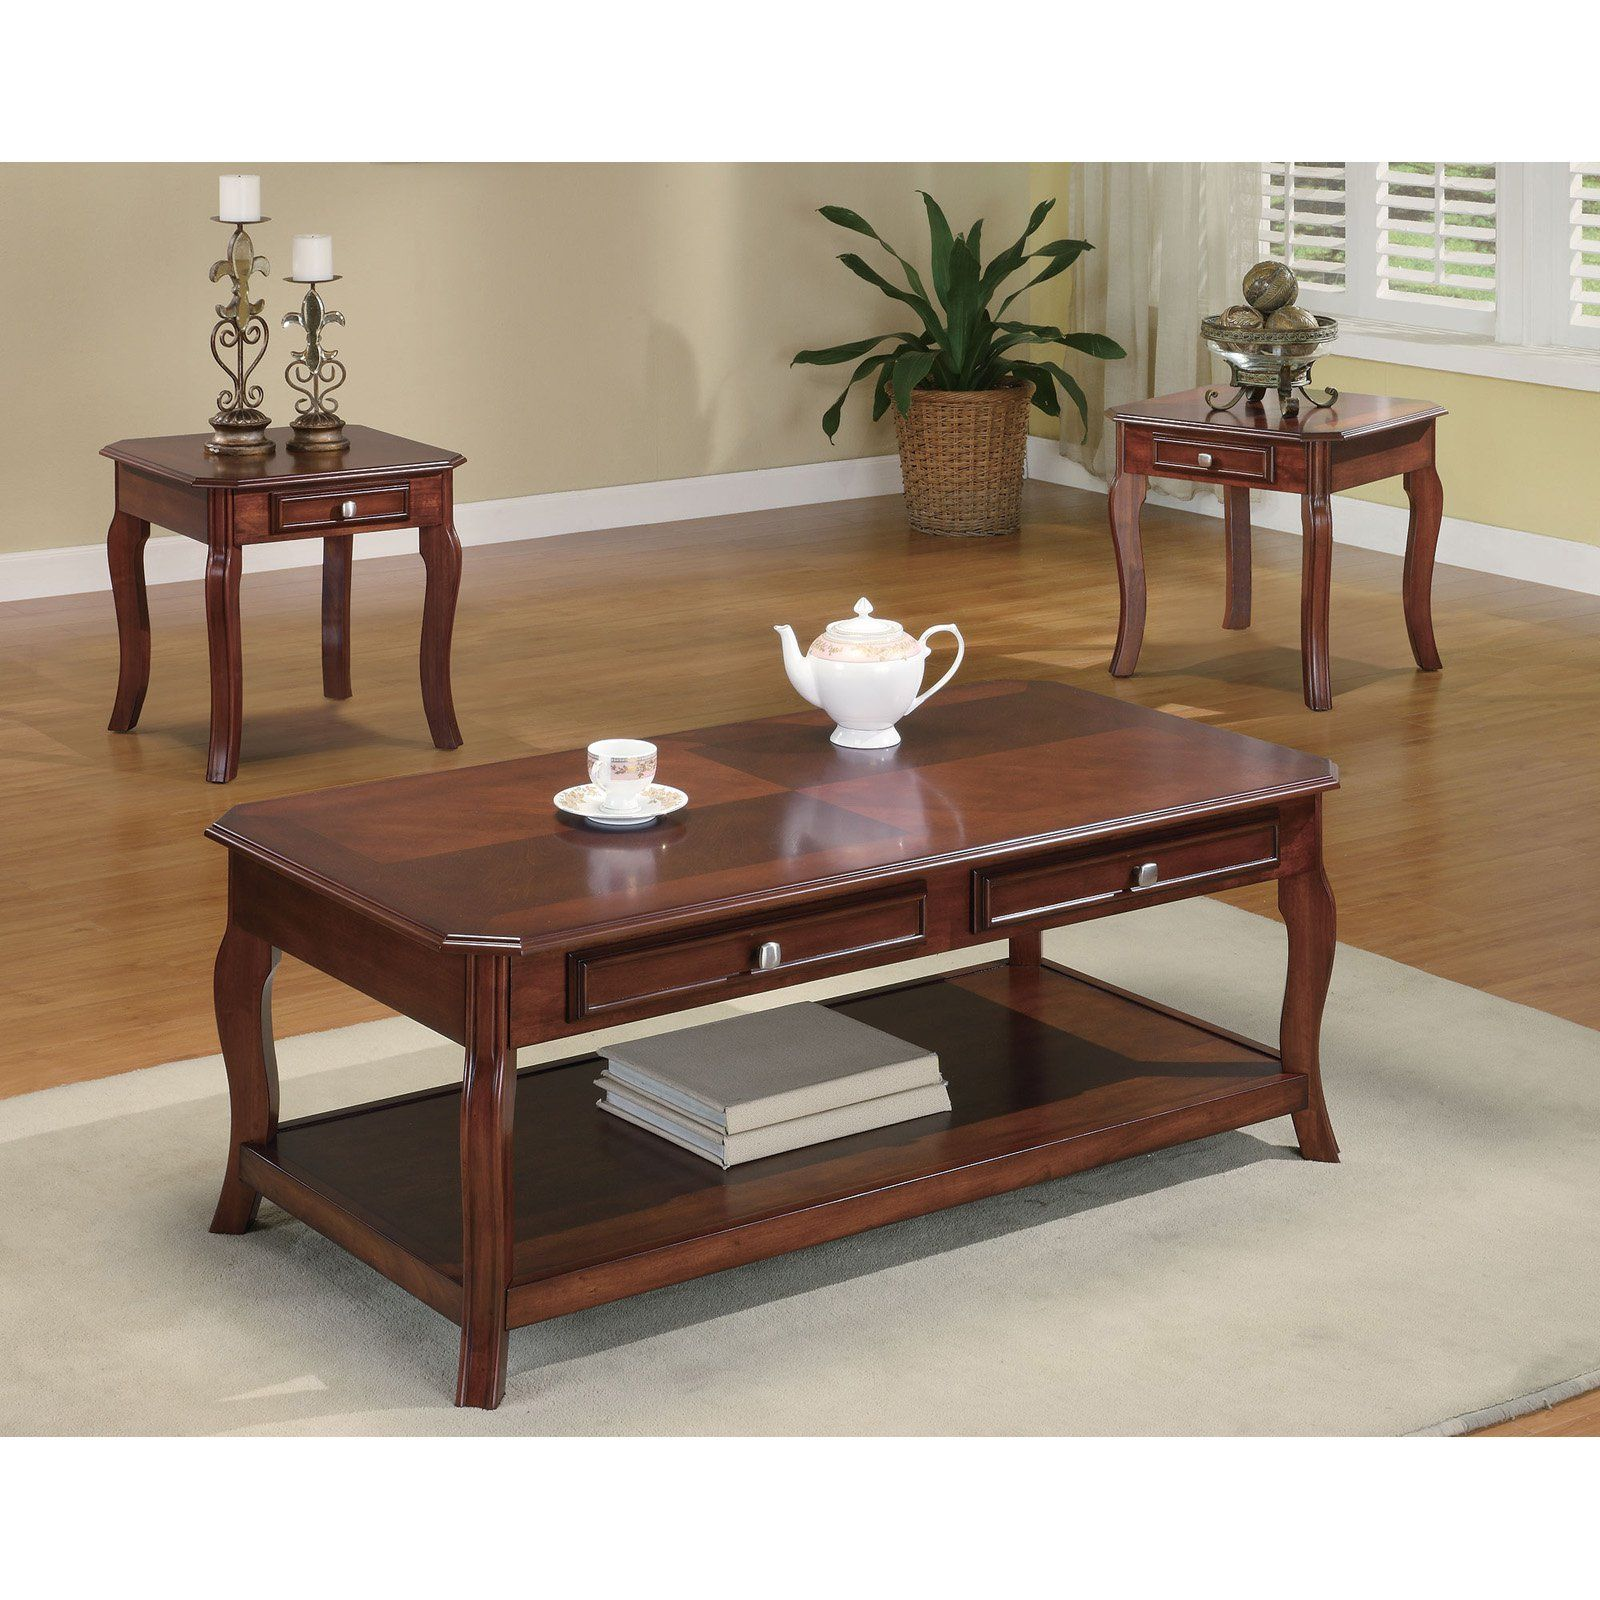 Coaster Furniture 3 Piece Coffee Table